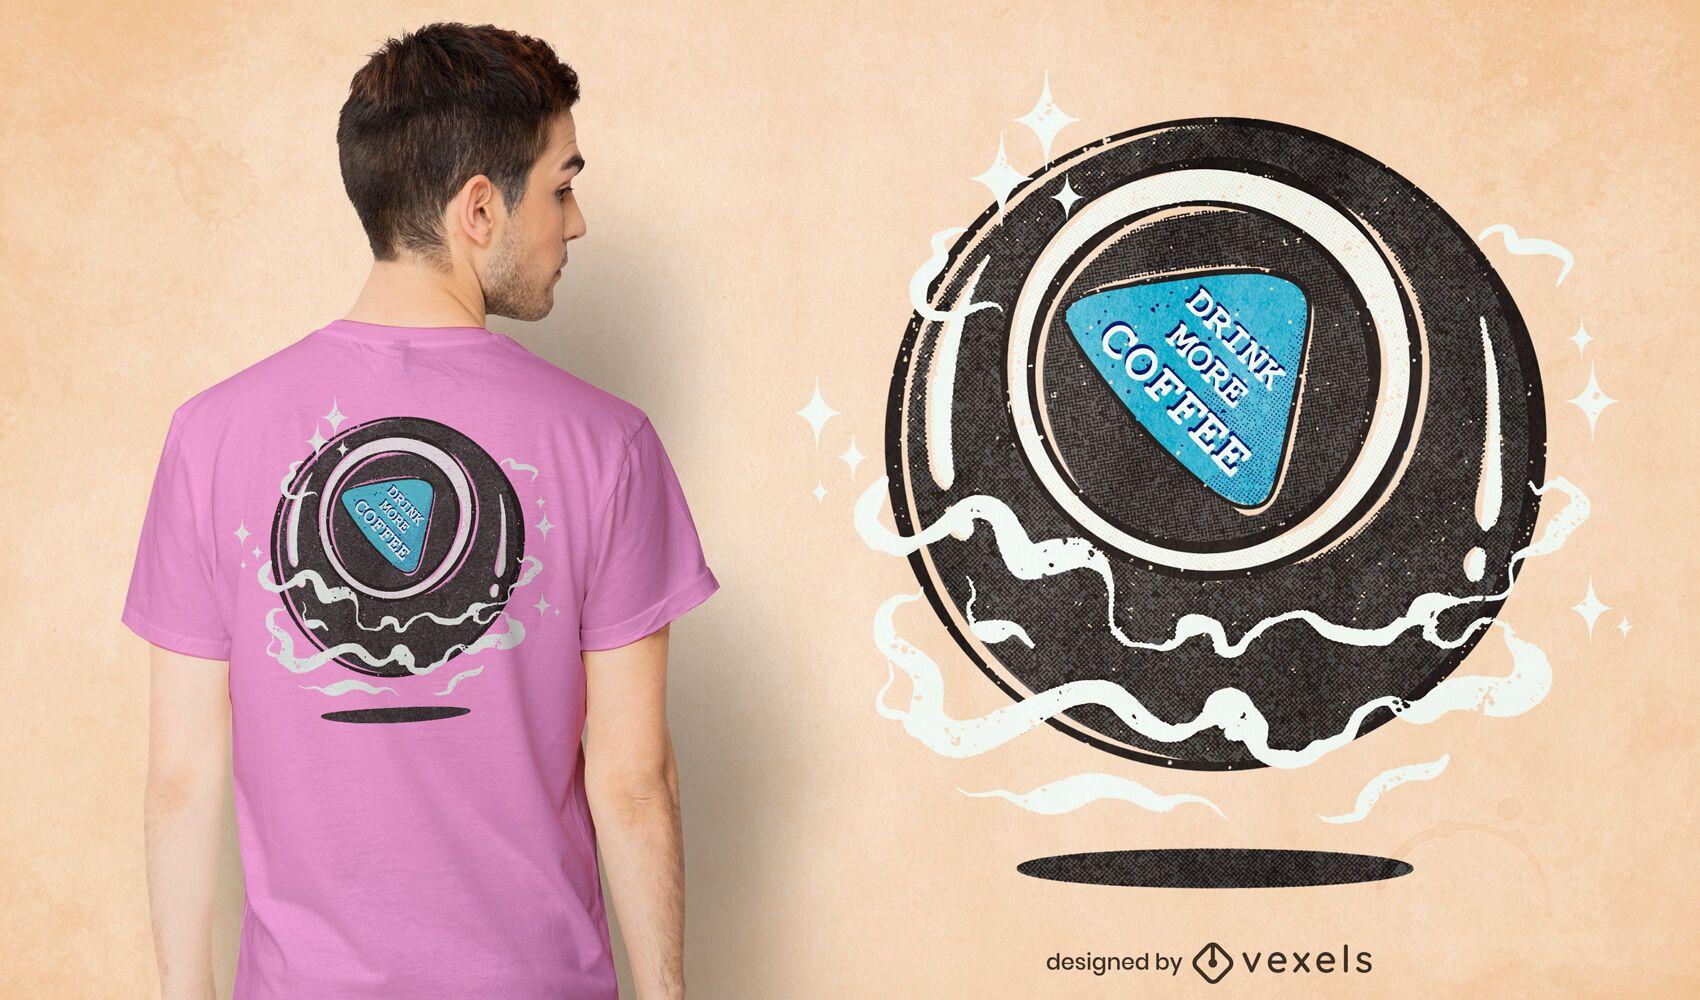 Magic ball t-shirt design